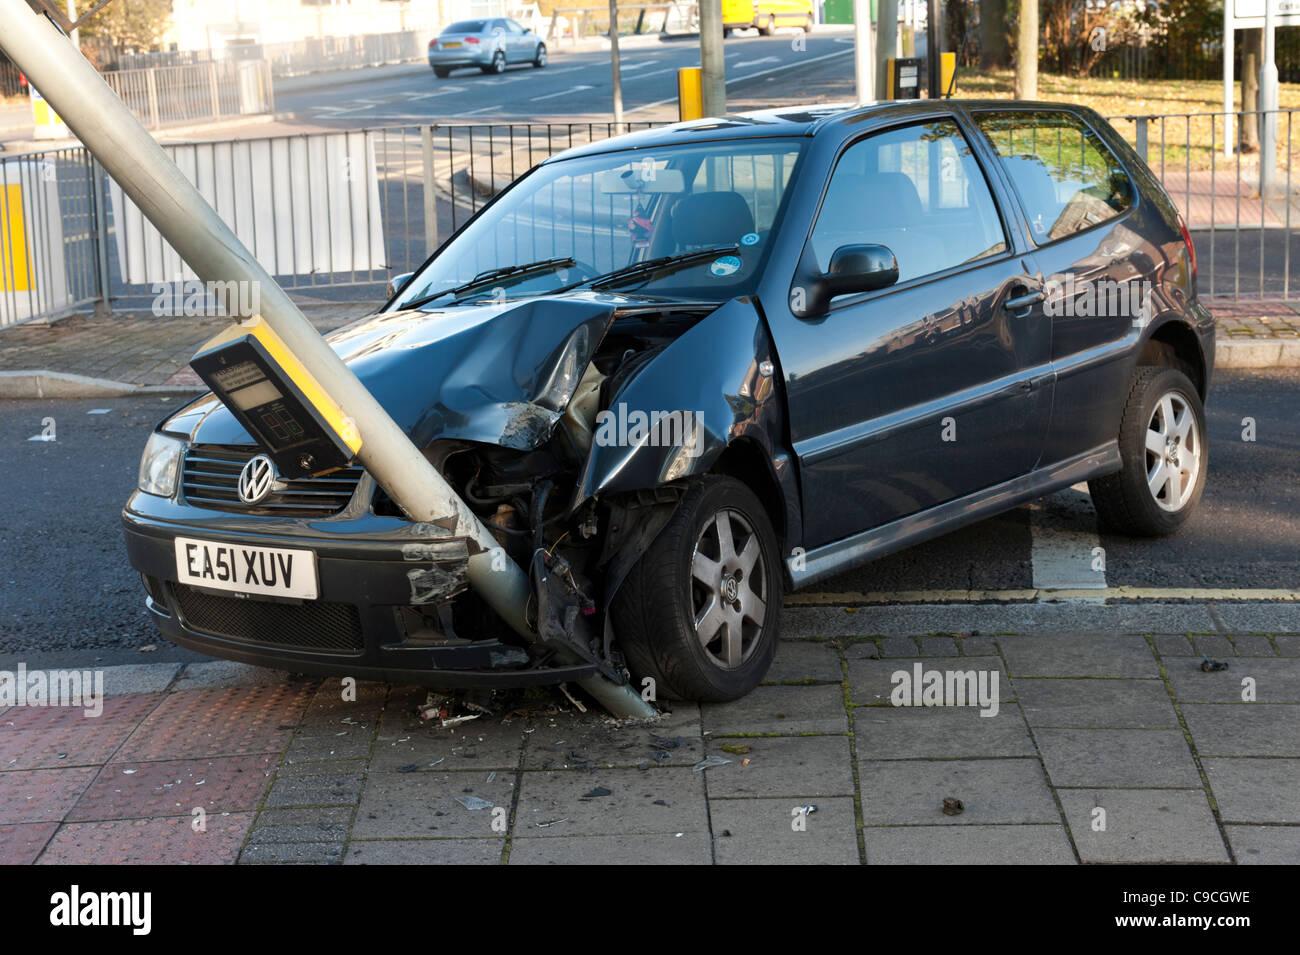 Car Accident Uk Stock Photos Car Accident Uk Stock Images Alamy